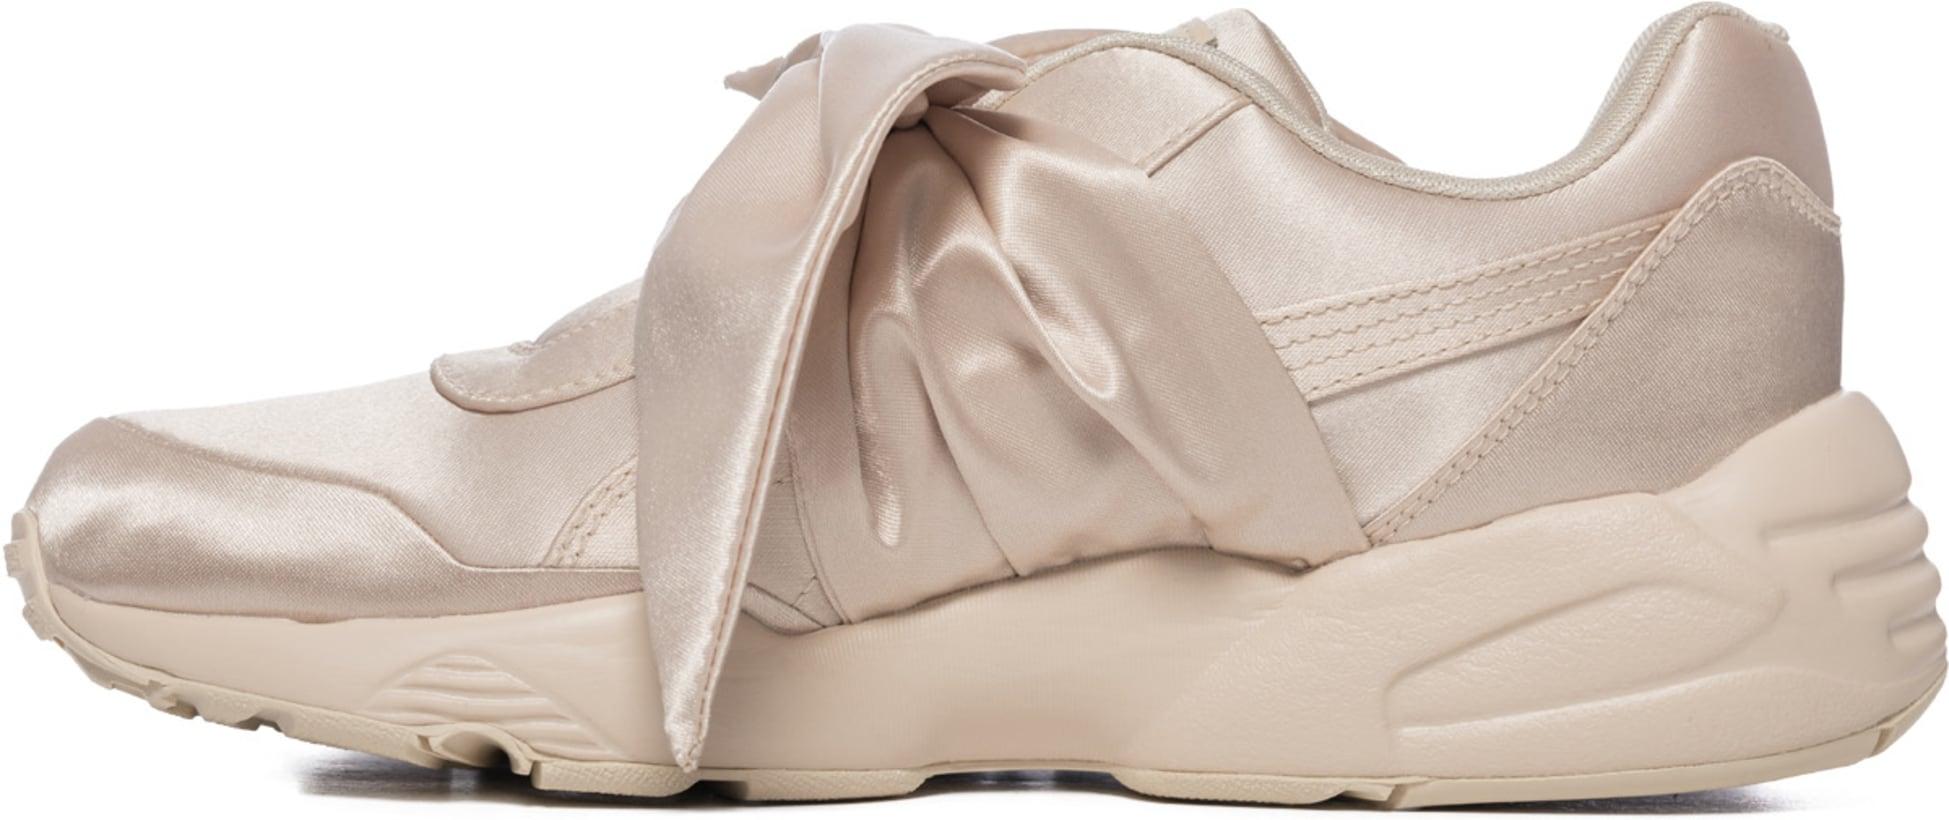 Puma Chaussures Fenty Bow Rose Teint